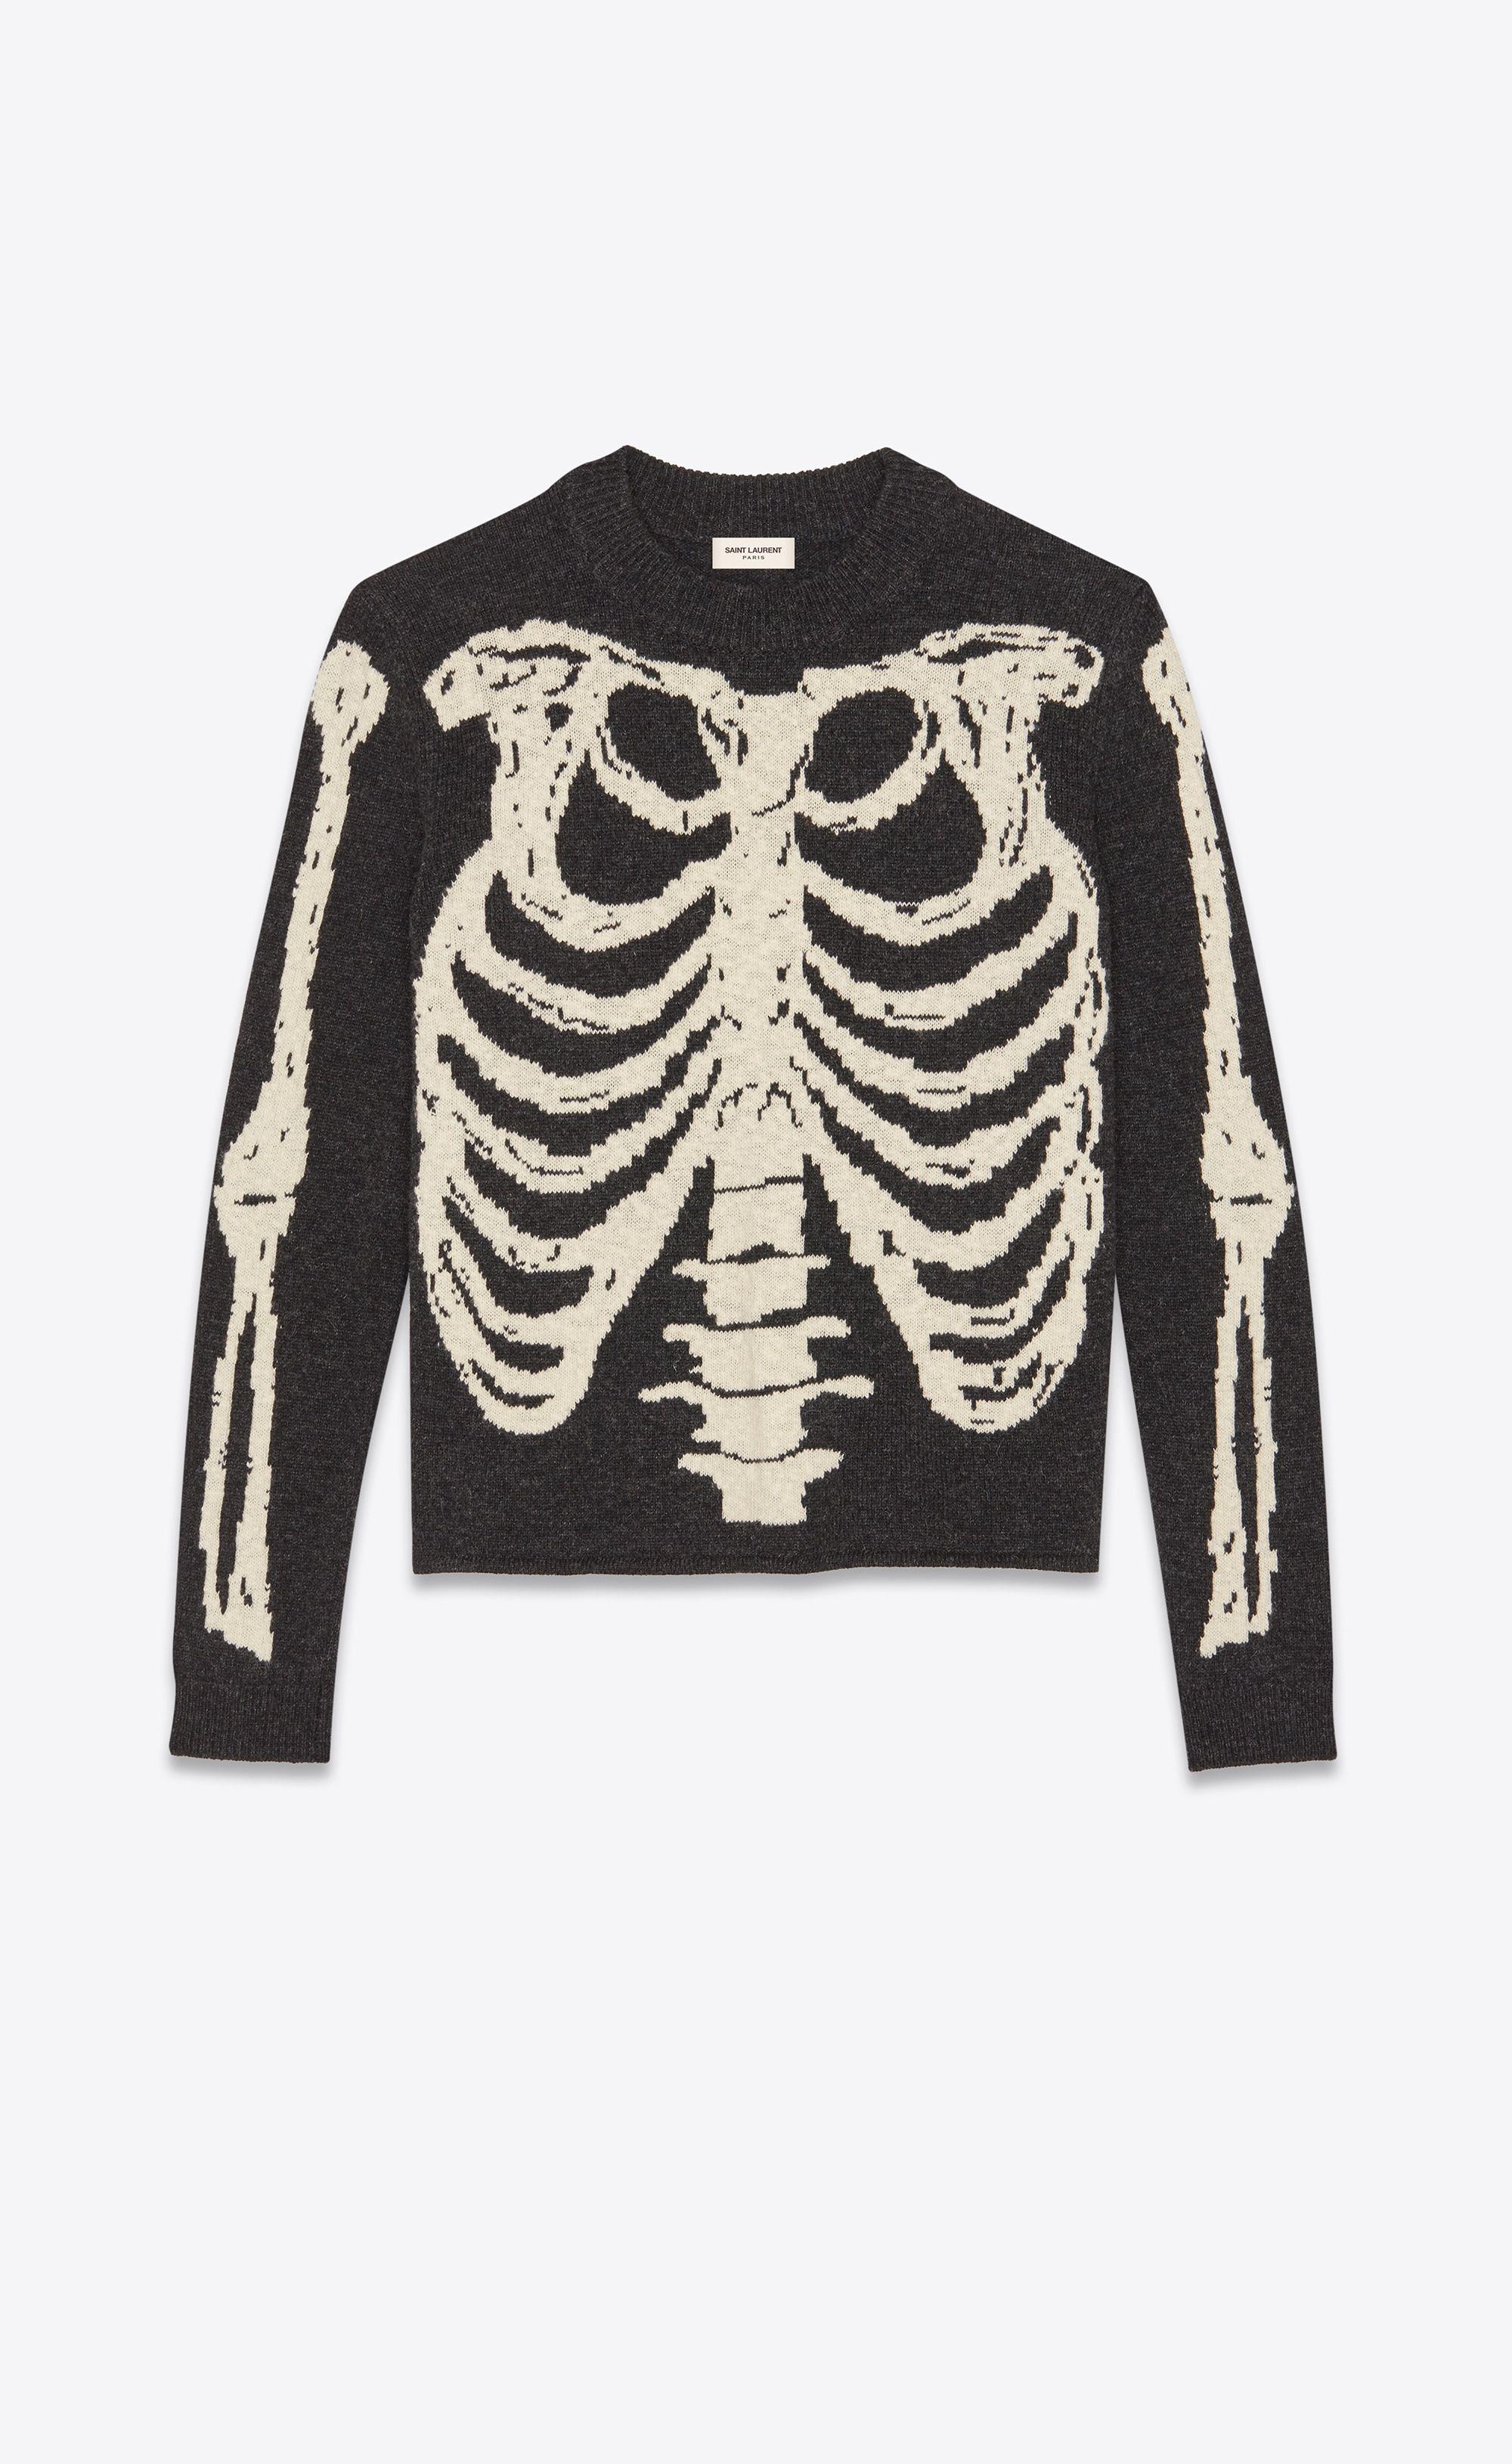 d23f08157b Skeleton jacquard knit   Personal - current looks   Sweaters ...